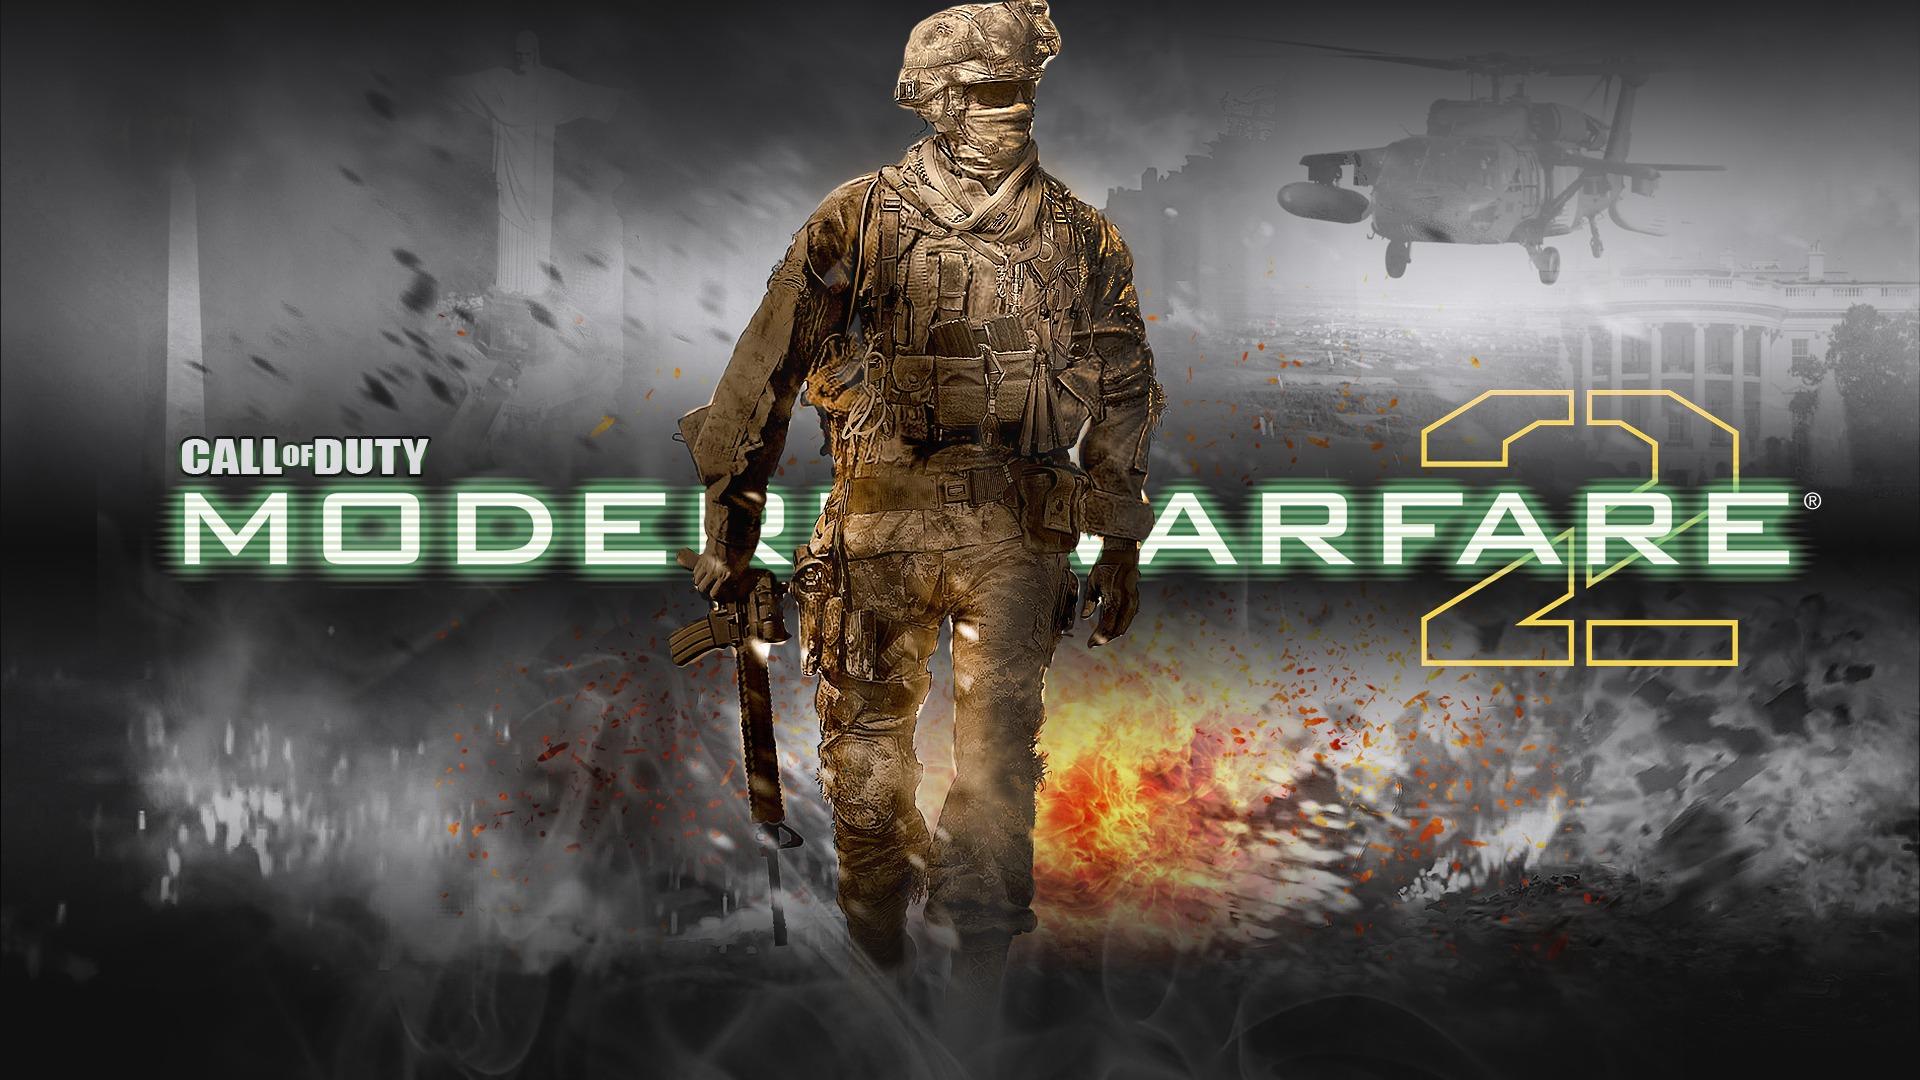 Call of Duty: Modern Warfare 2 Remastered en camino, Amazon lo lista